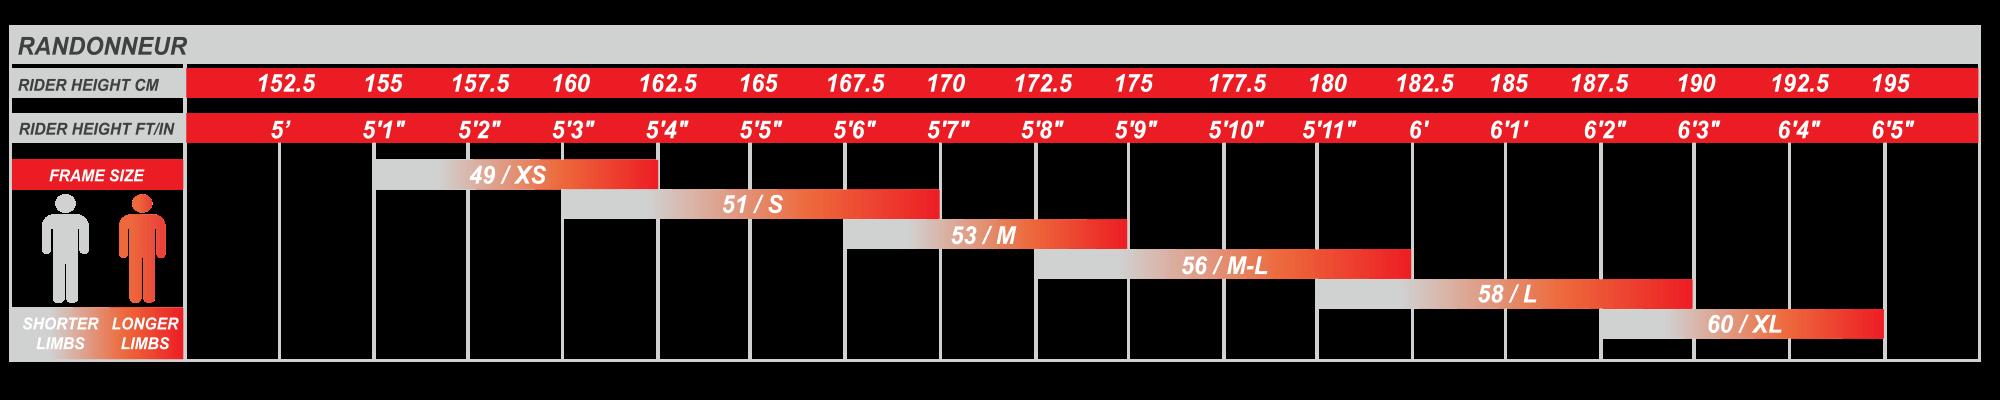 geo-size-chart-rando-2018.2.png